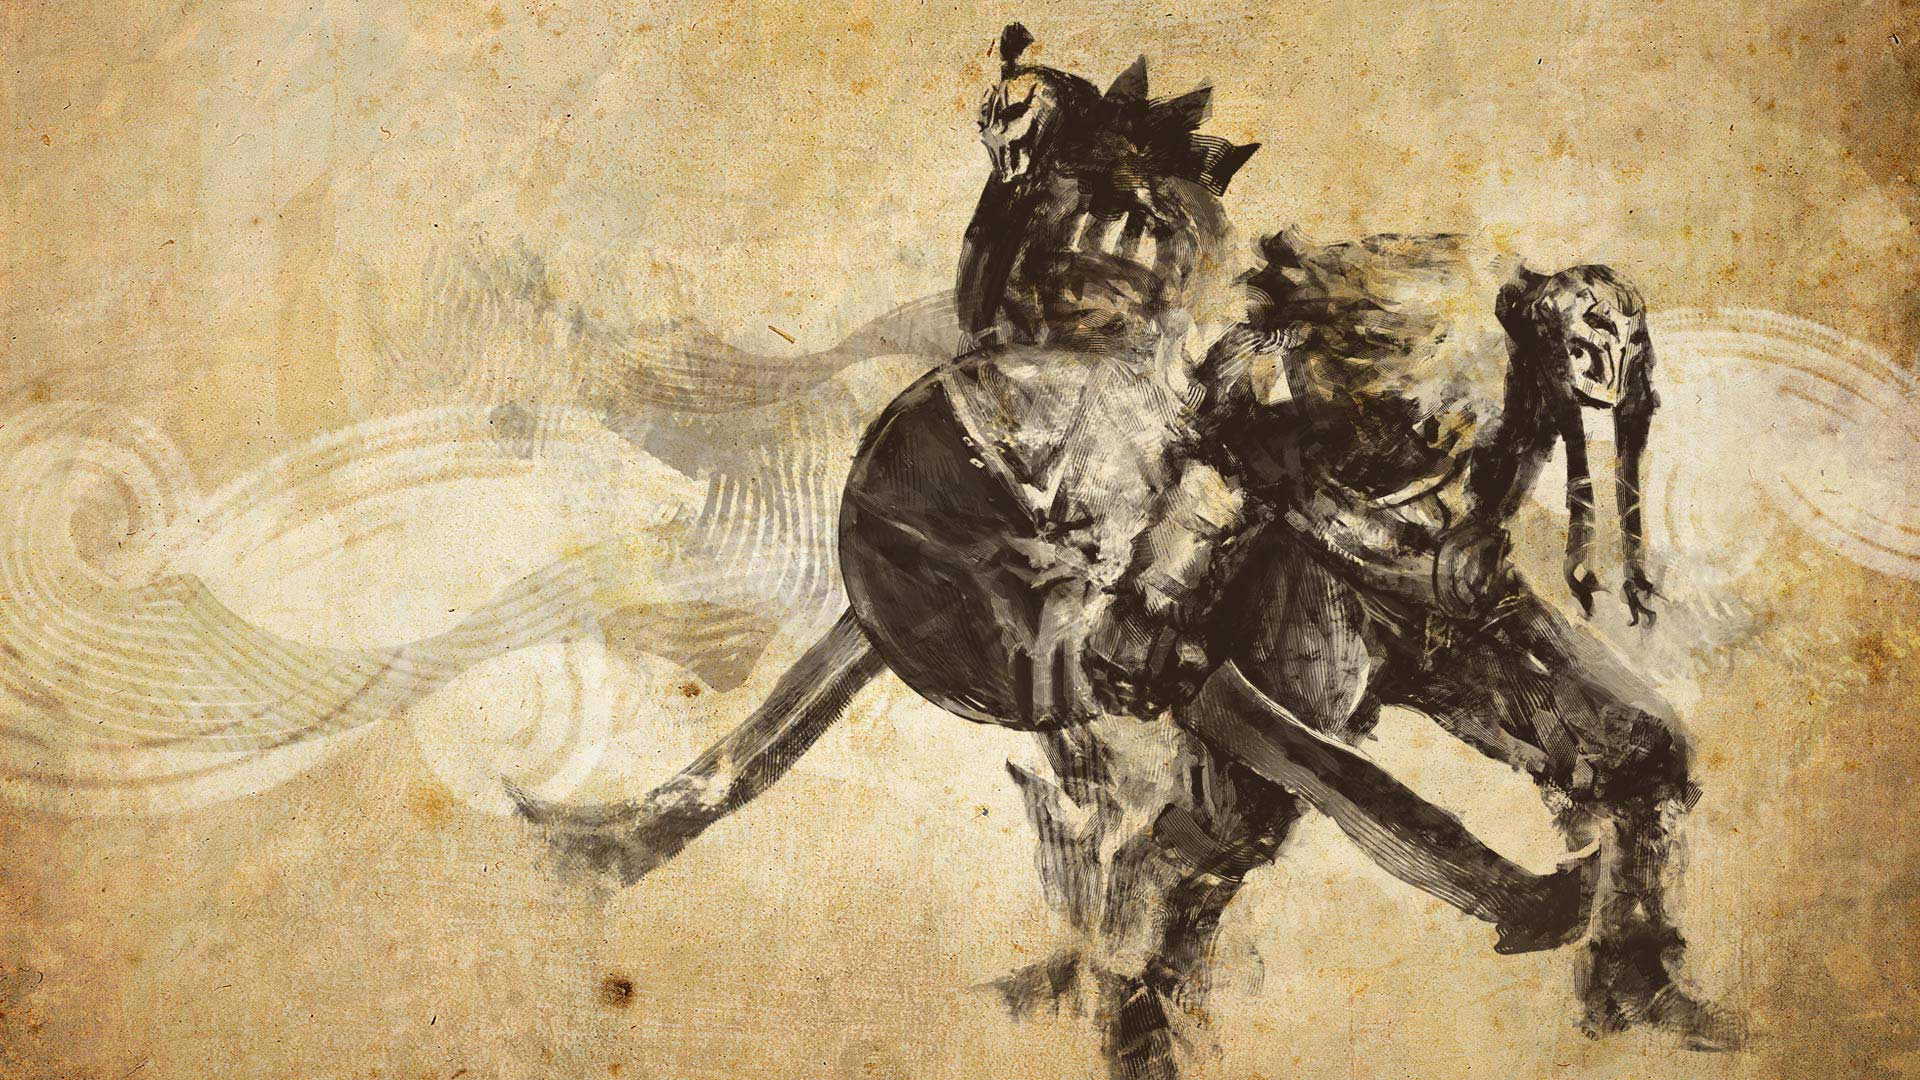 Wolf Wallpaper Hd Free Download Pixelstalk Image Result For Lone